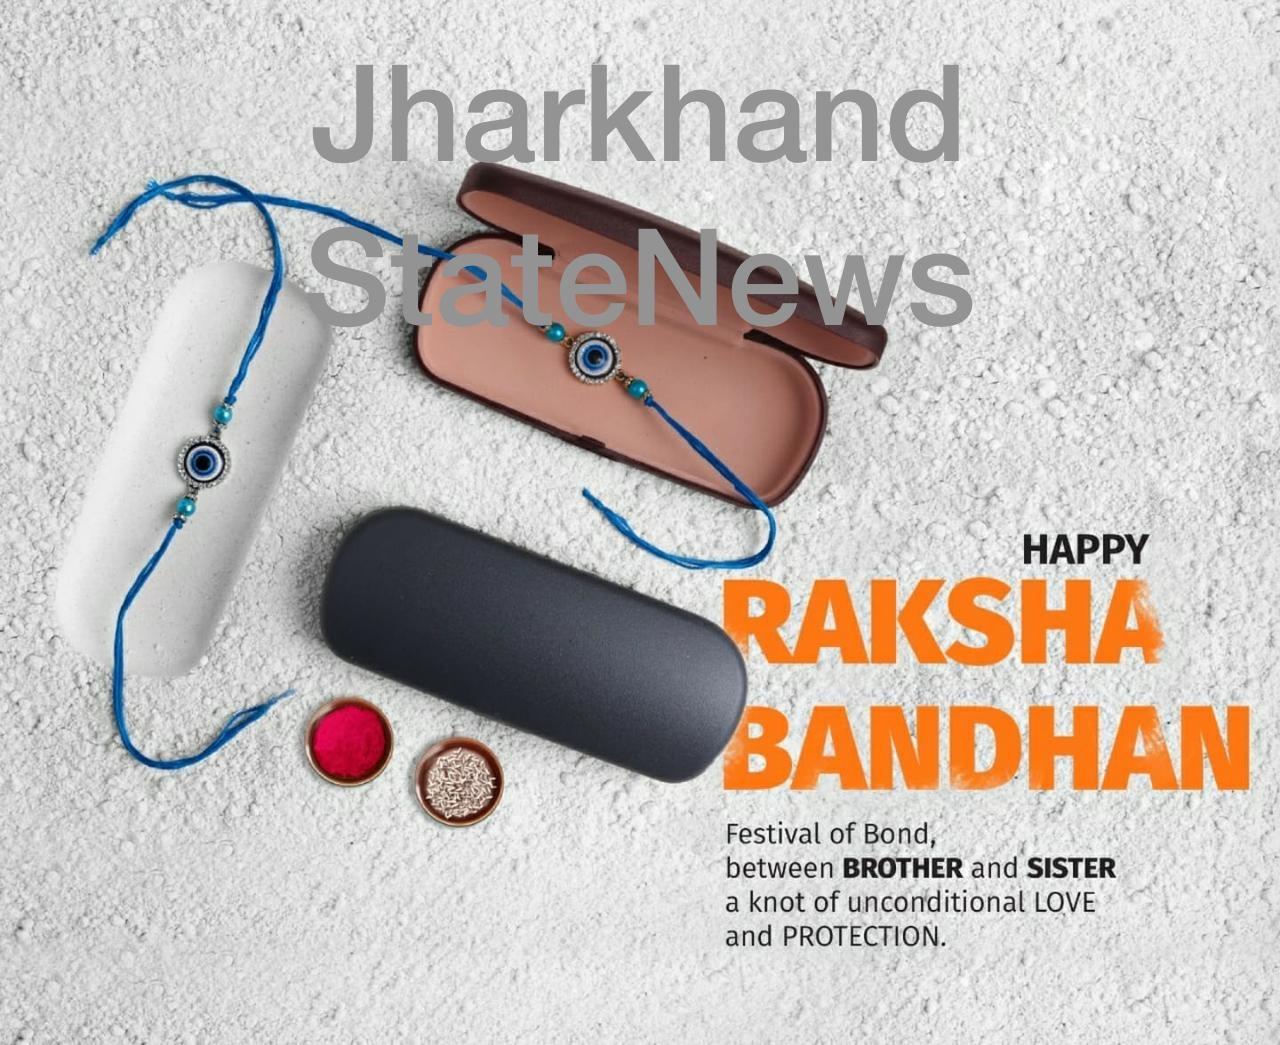 <p>Happy Raksha Bandhan. Editor</p>